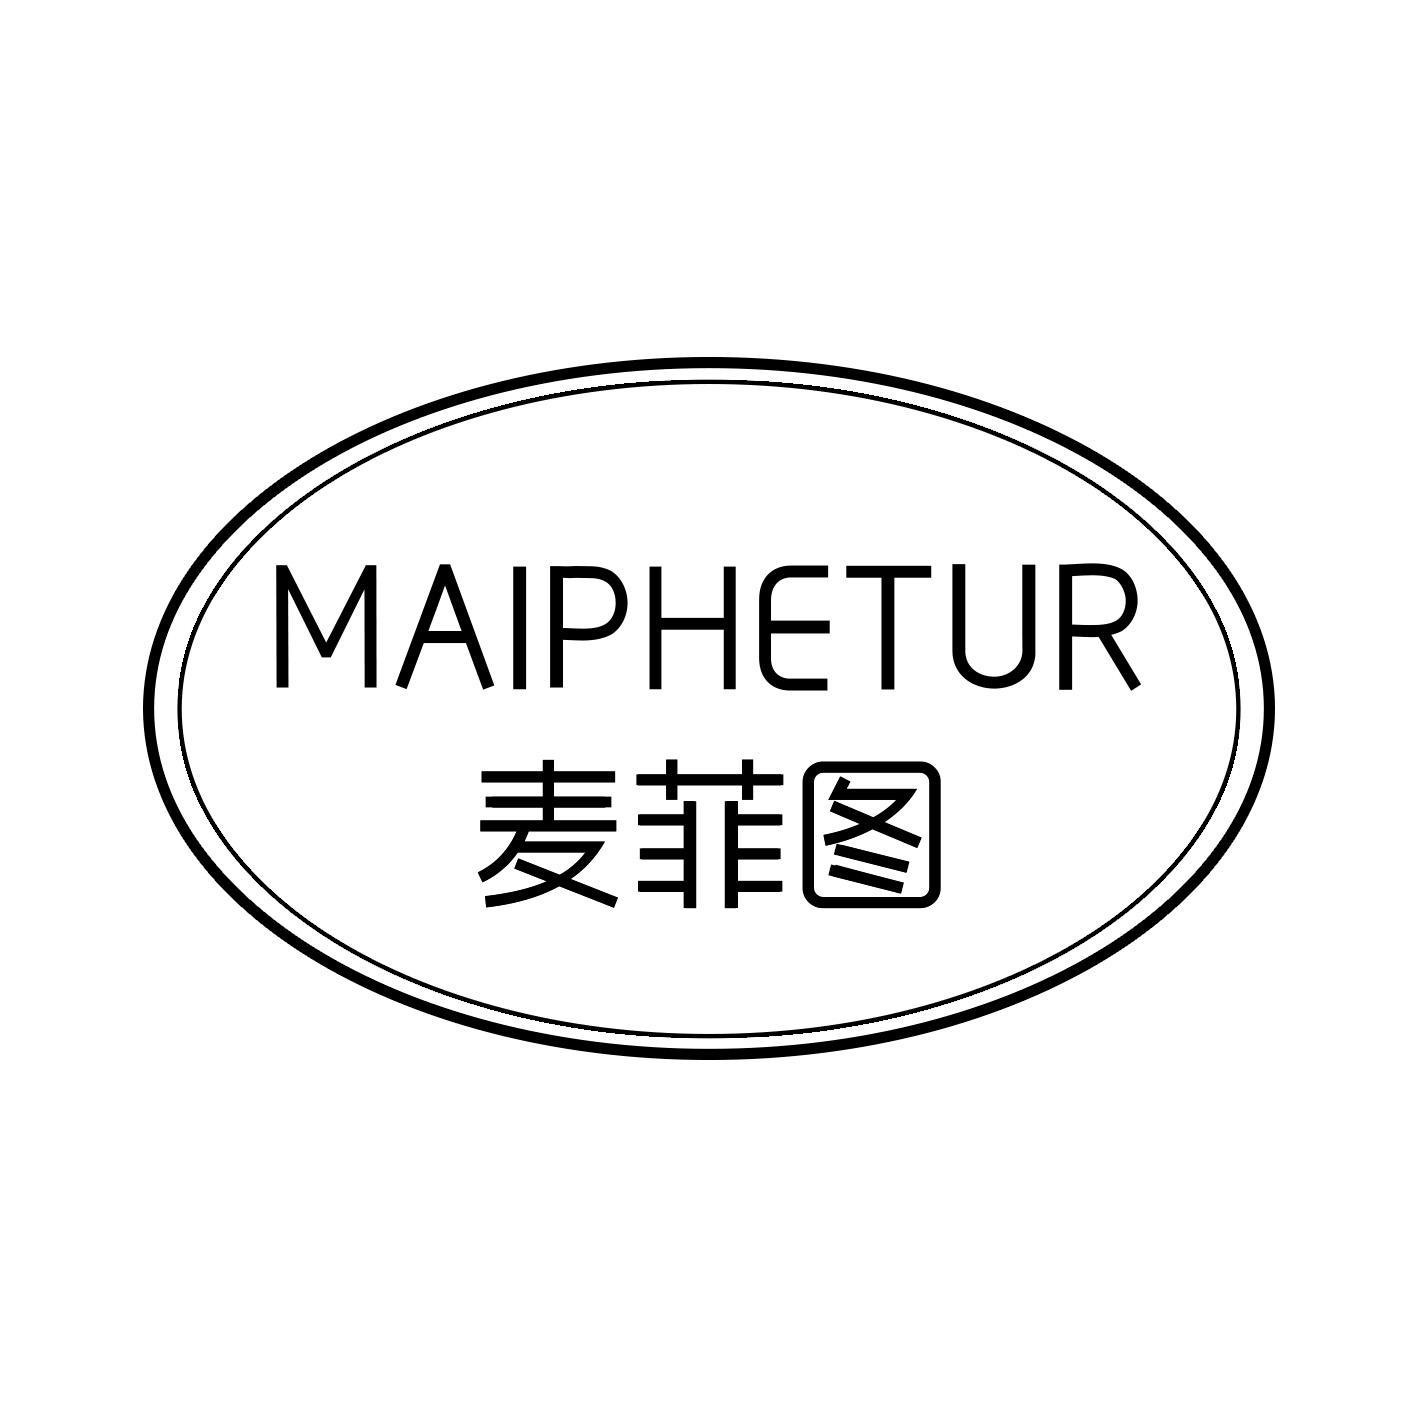 麦菲图 MAIPHETUR